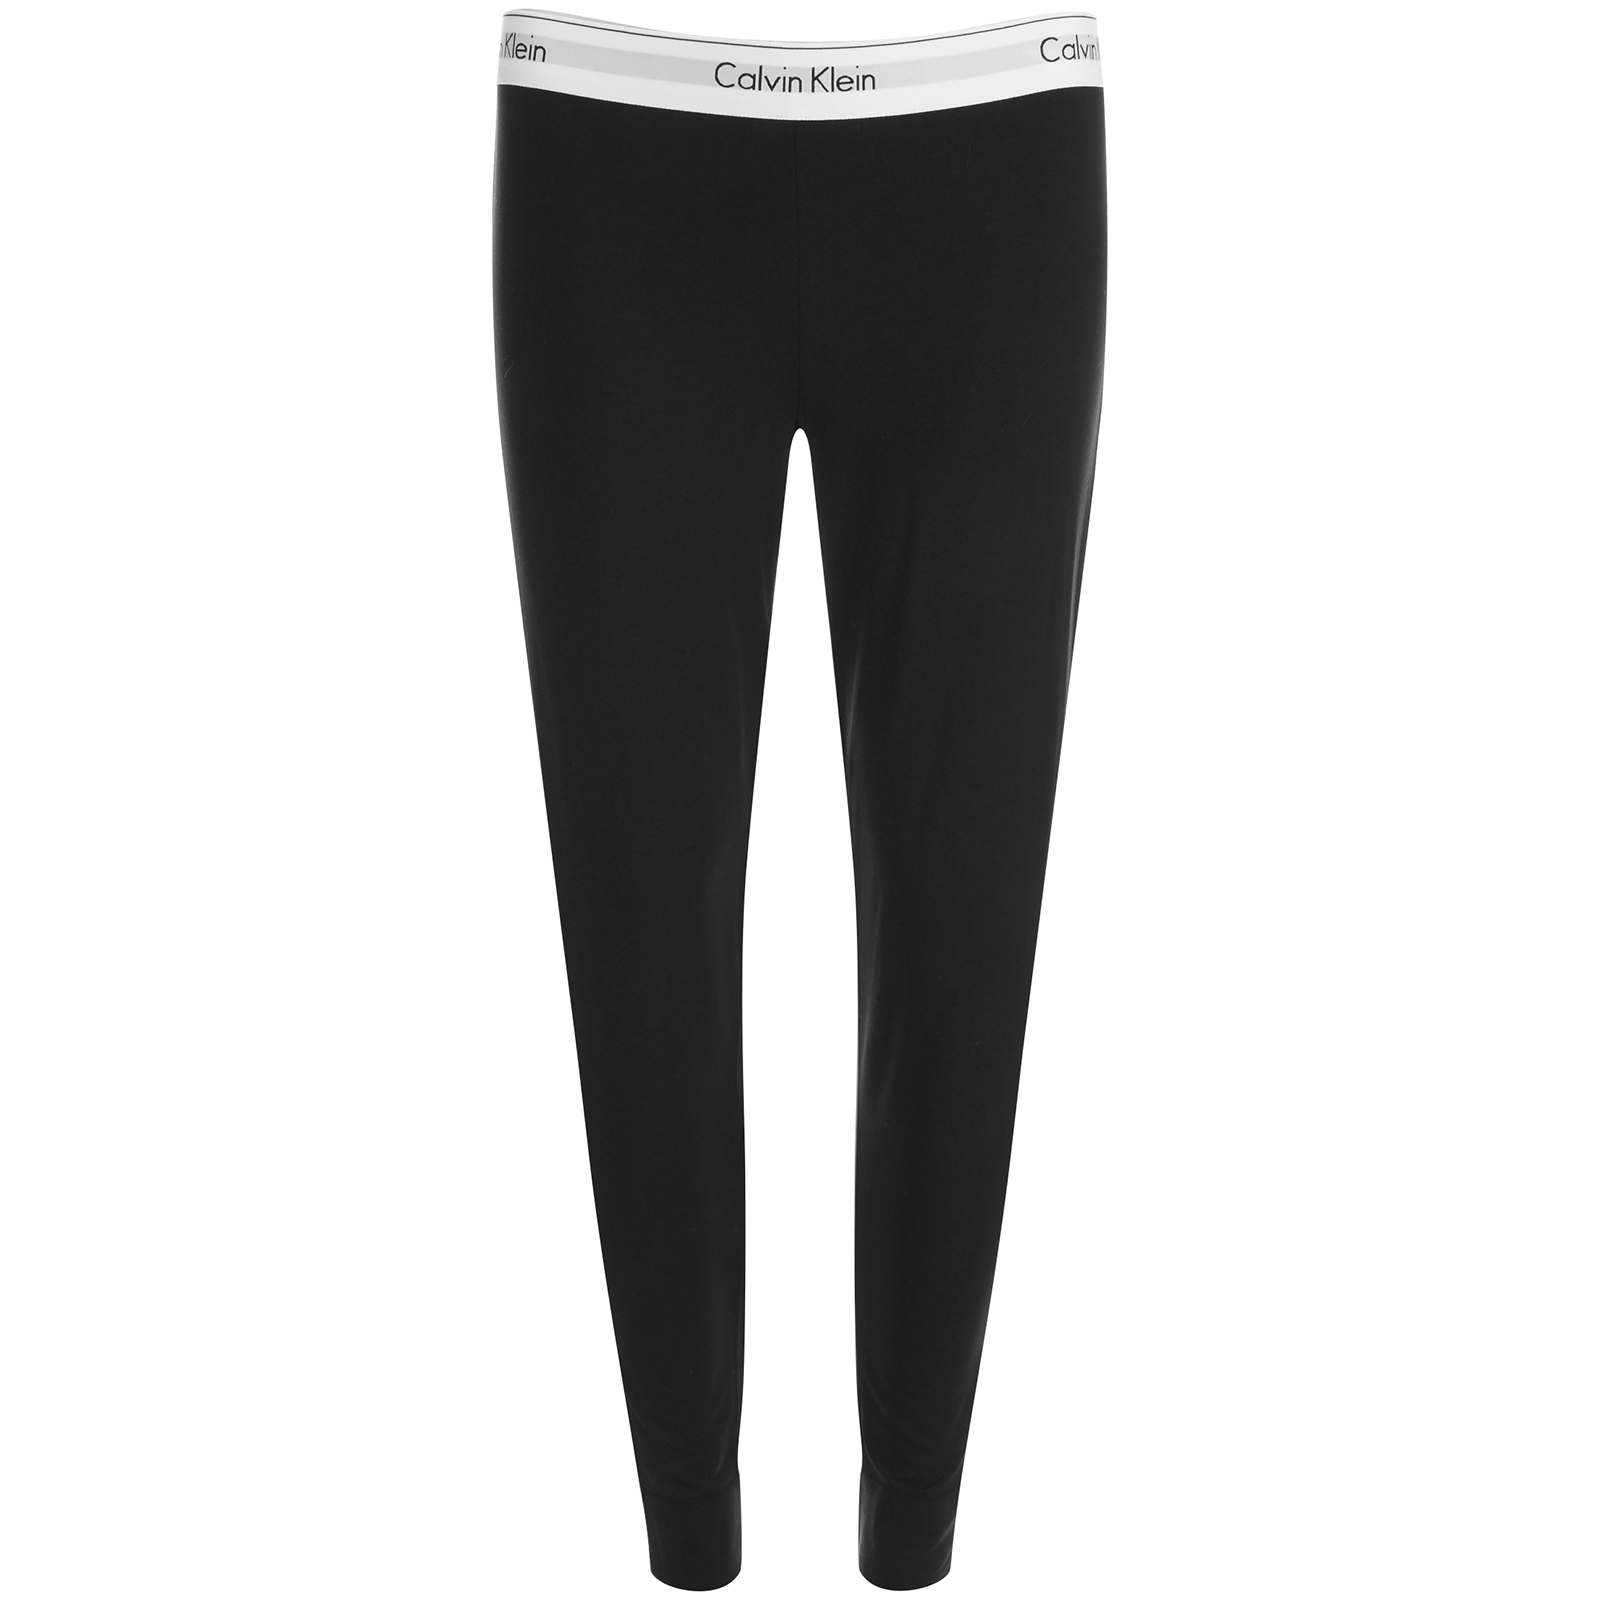 Calvin Klein Women's Modern Cotton Legging Pants - Black - S - Black